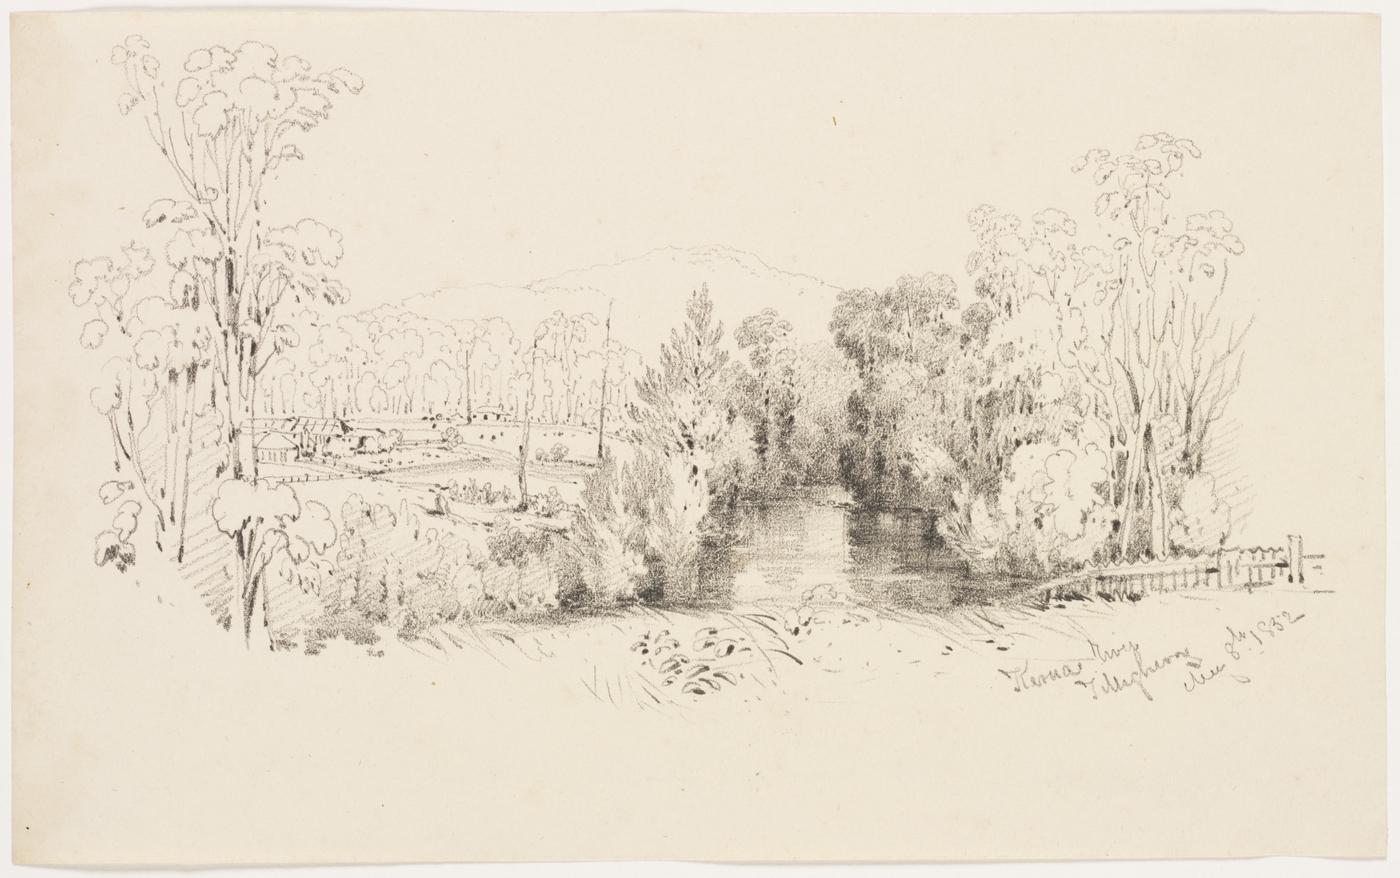 54. Kerua River, Tilligherry, 8th May 1852